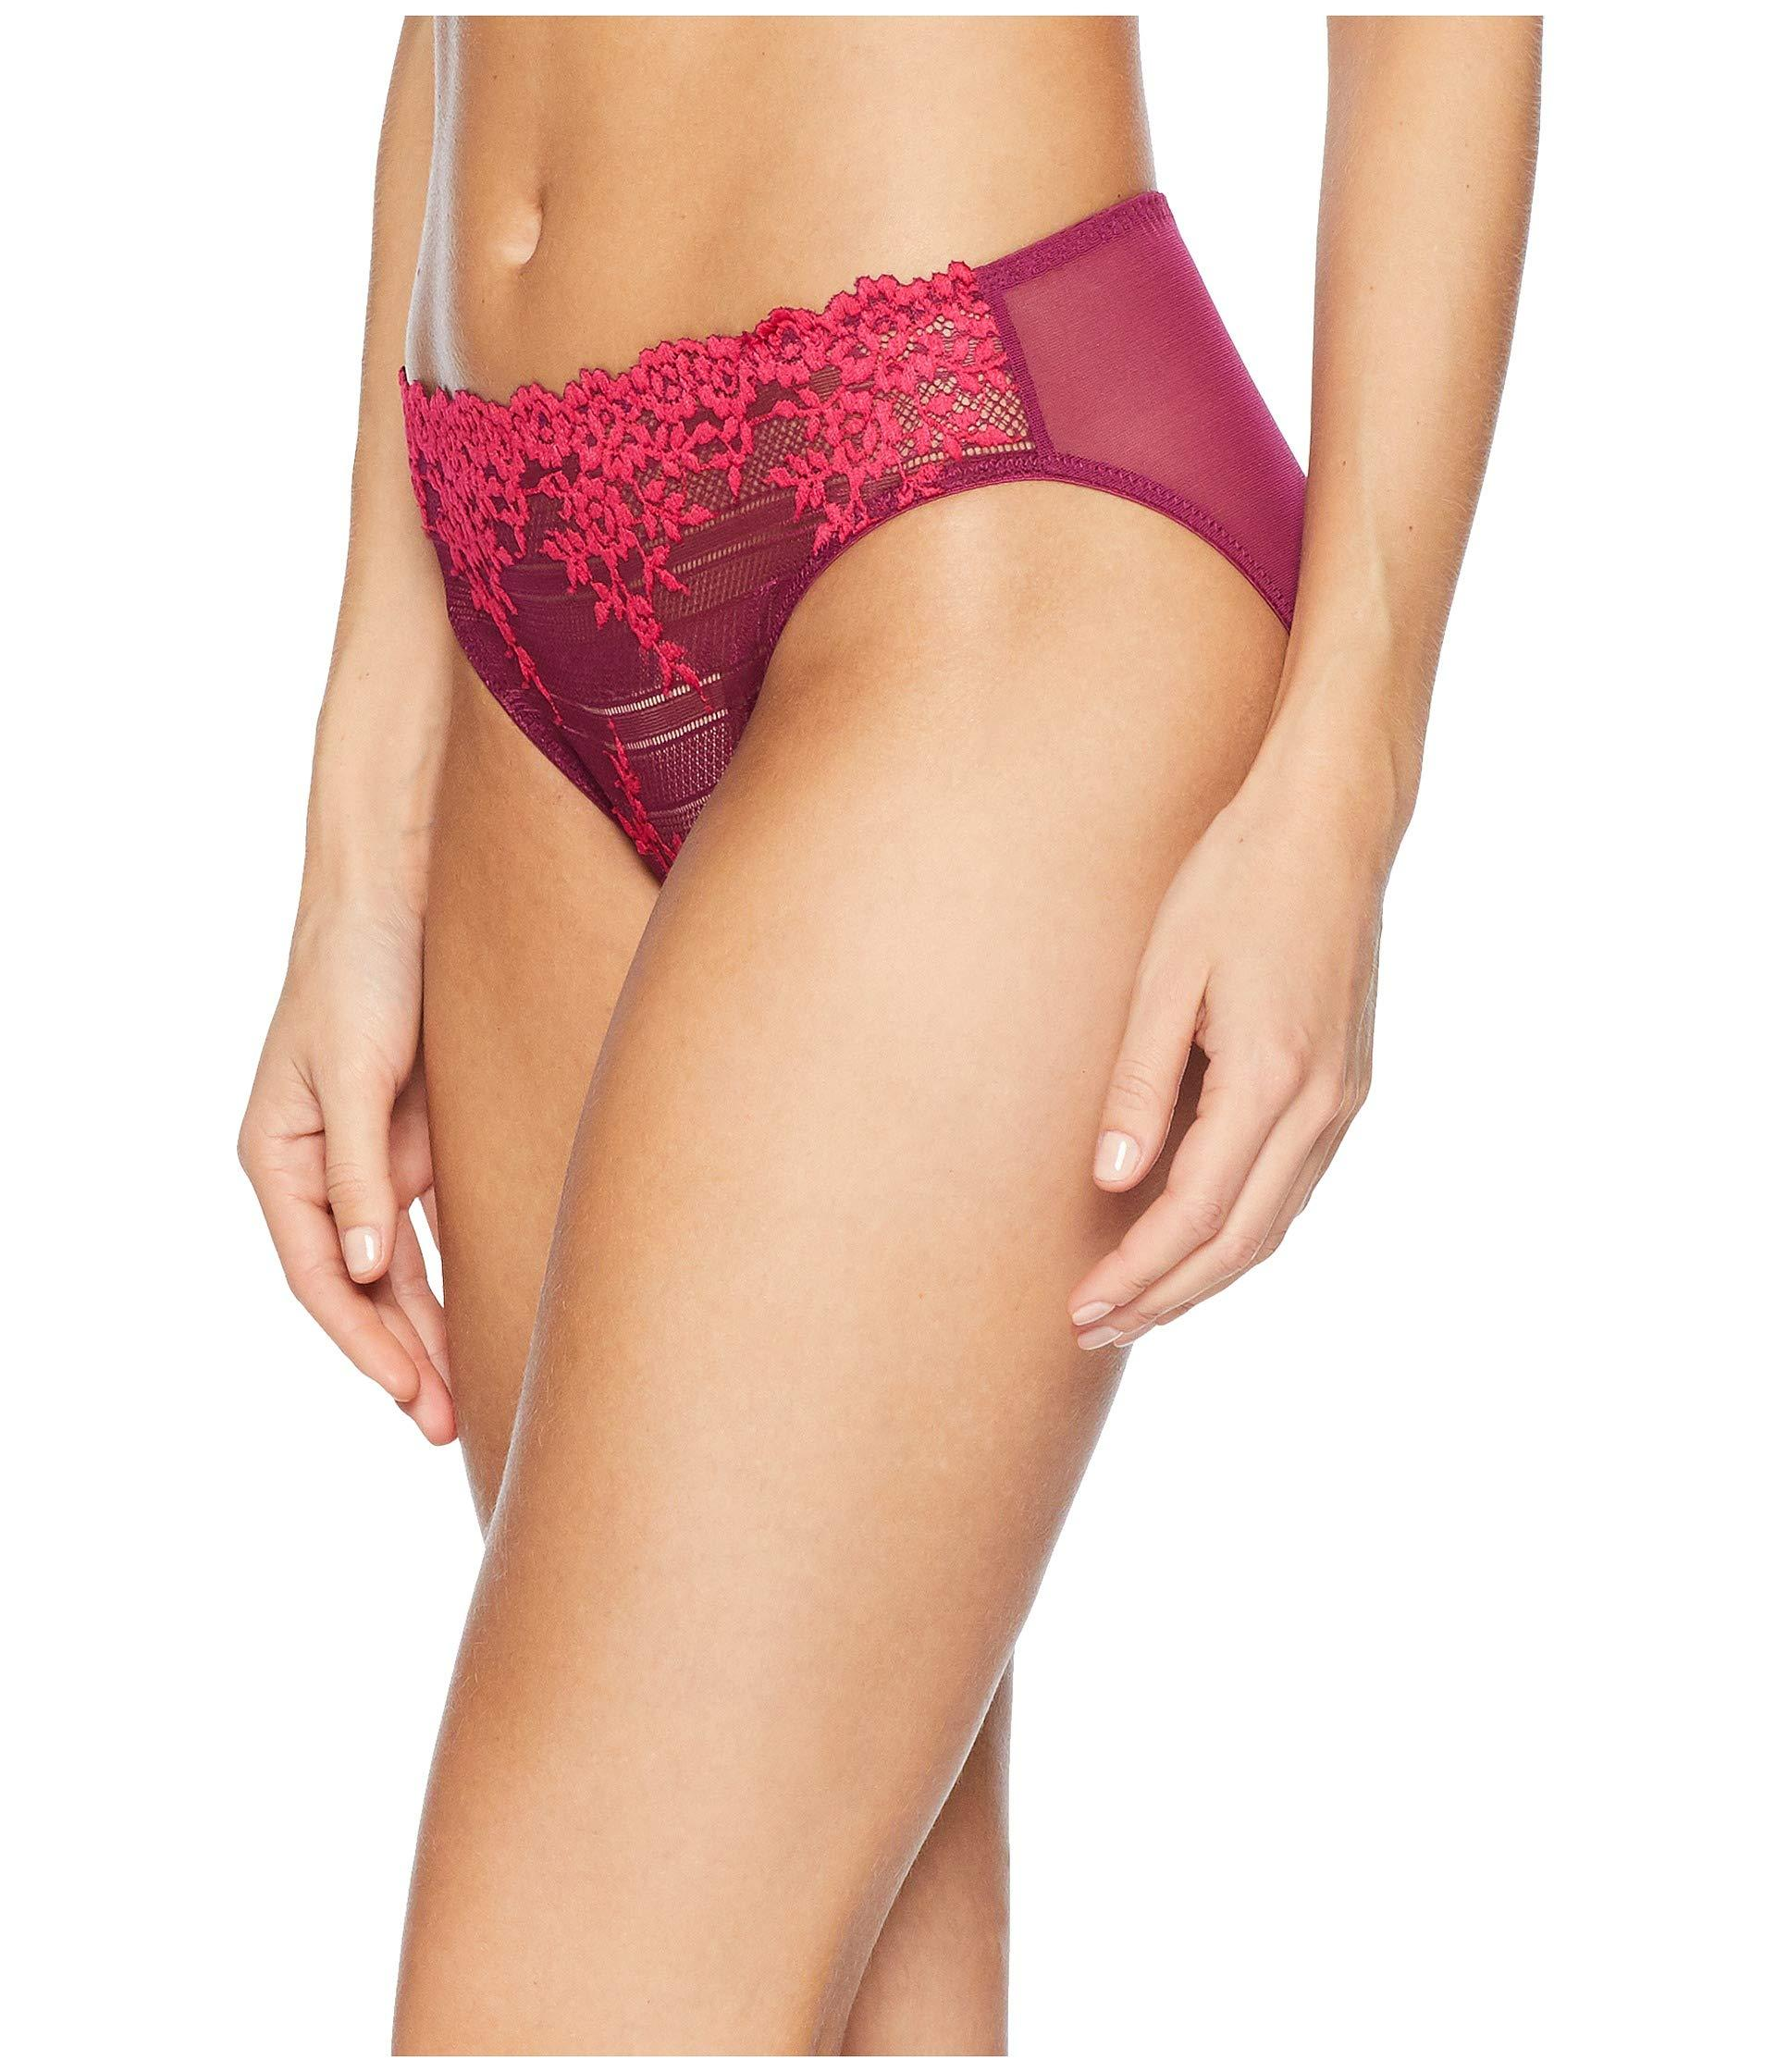 243686f5d9583 Lyst - Wacoal Embrace Lace Bikini